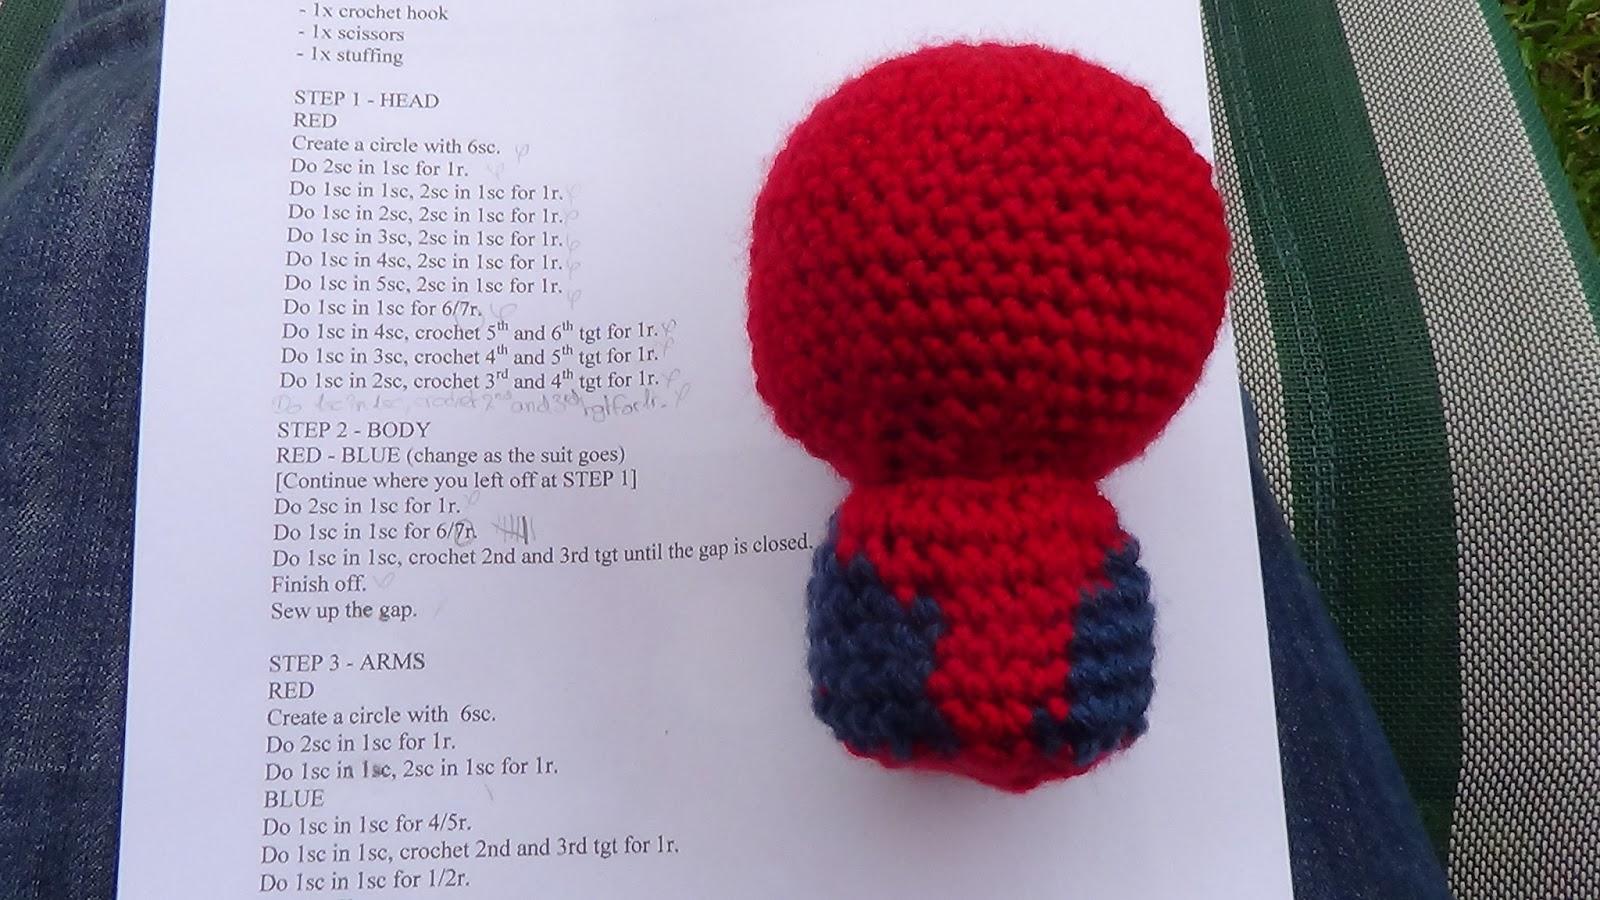 Knitting Pattern For Spiderman Doll : Crochet and Knitting 101: Spiderman Doll - Crochet